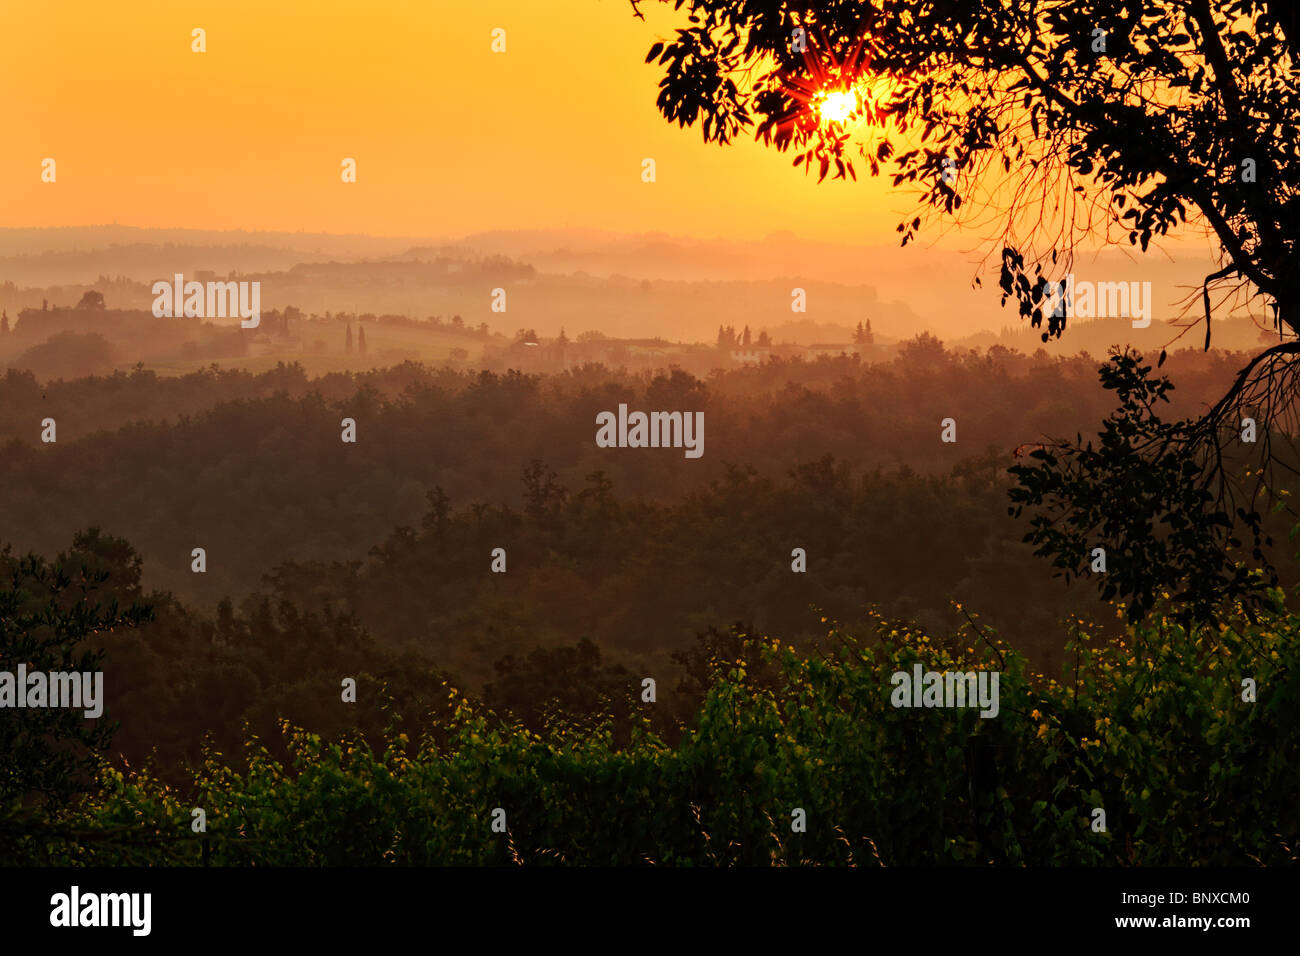 Toskanische Landschaft rund um San Gimignano, Italien bei Sonnenaufgang Stockbild